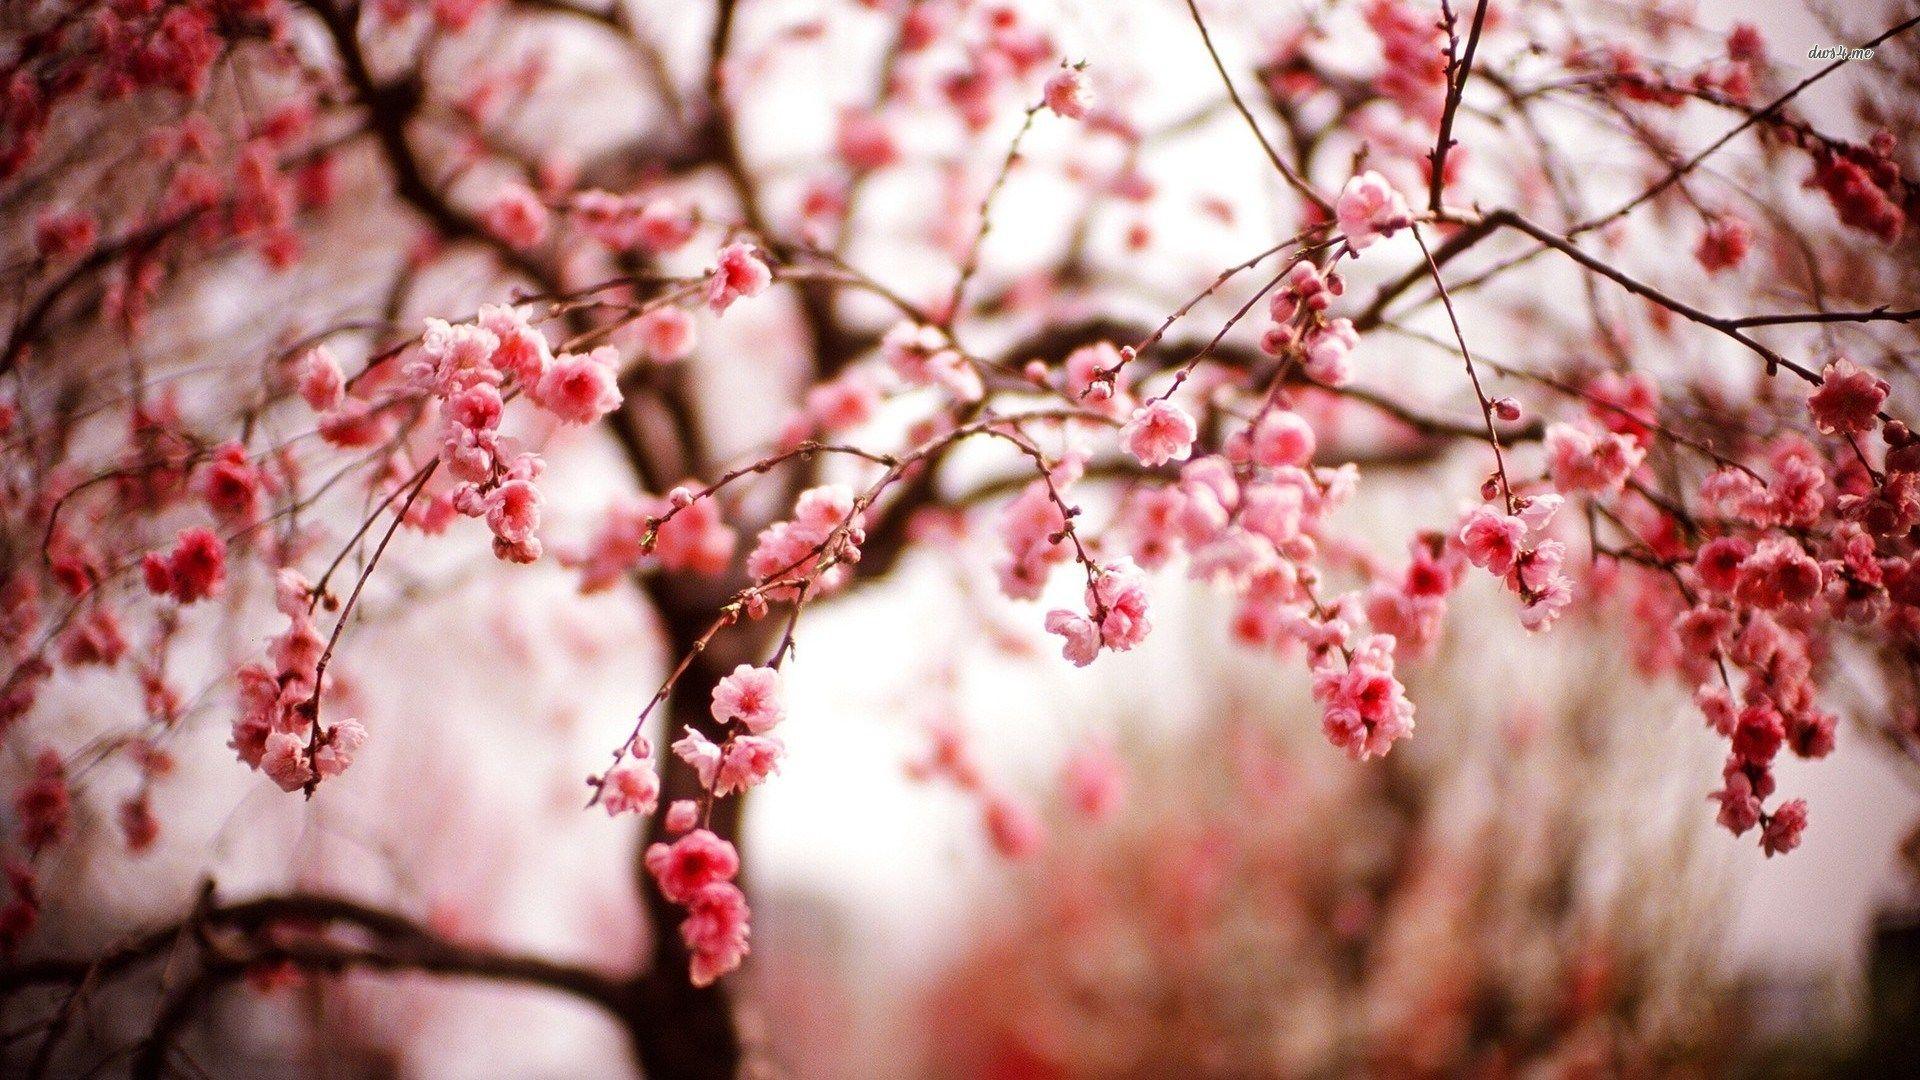 Cherry Blossom Free Desktop Wallpaper Cherry Blossom Wallpaper Cherry Blossom Tree Sakura Cherry Blossom